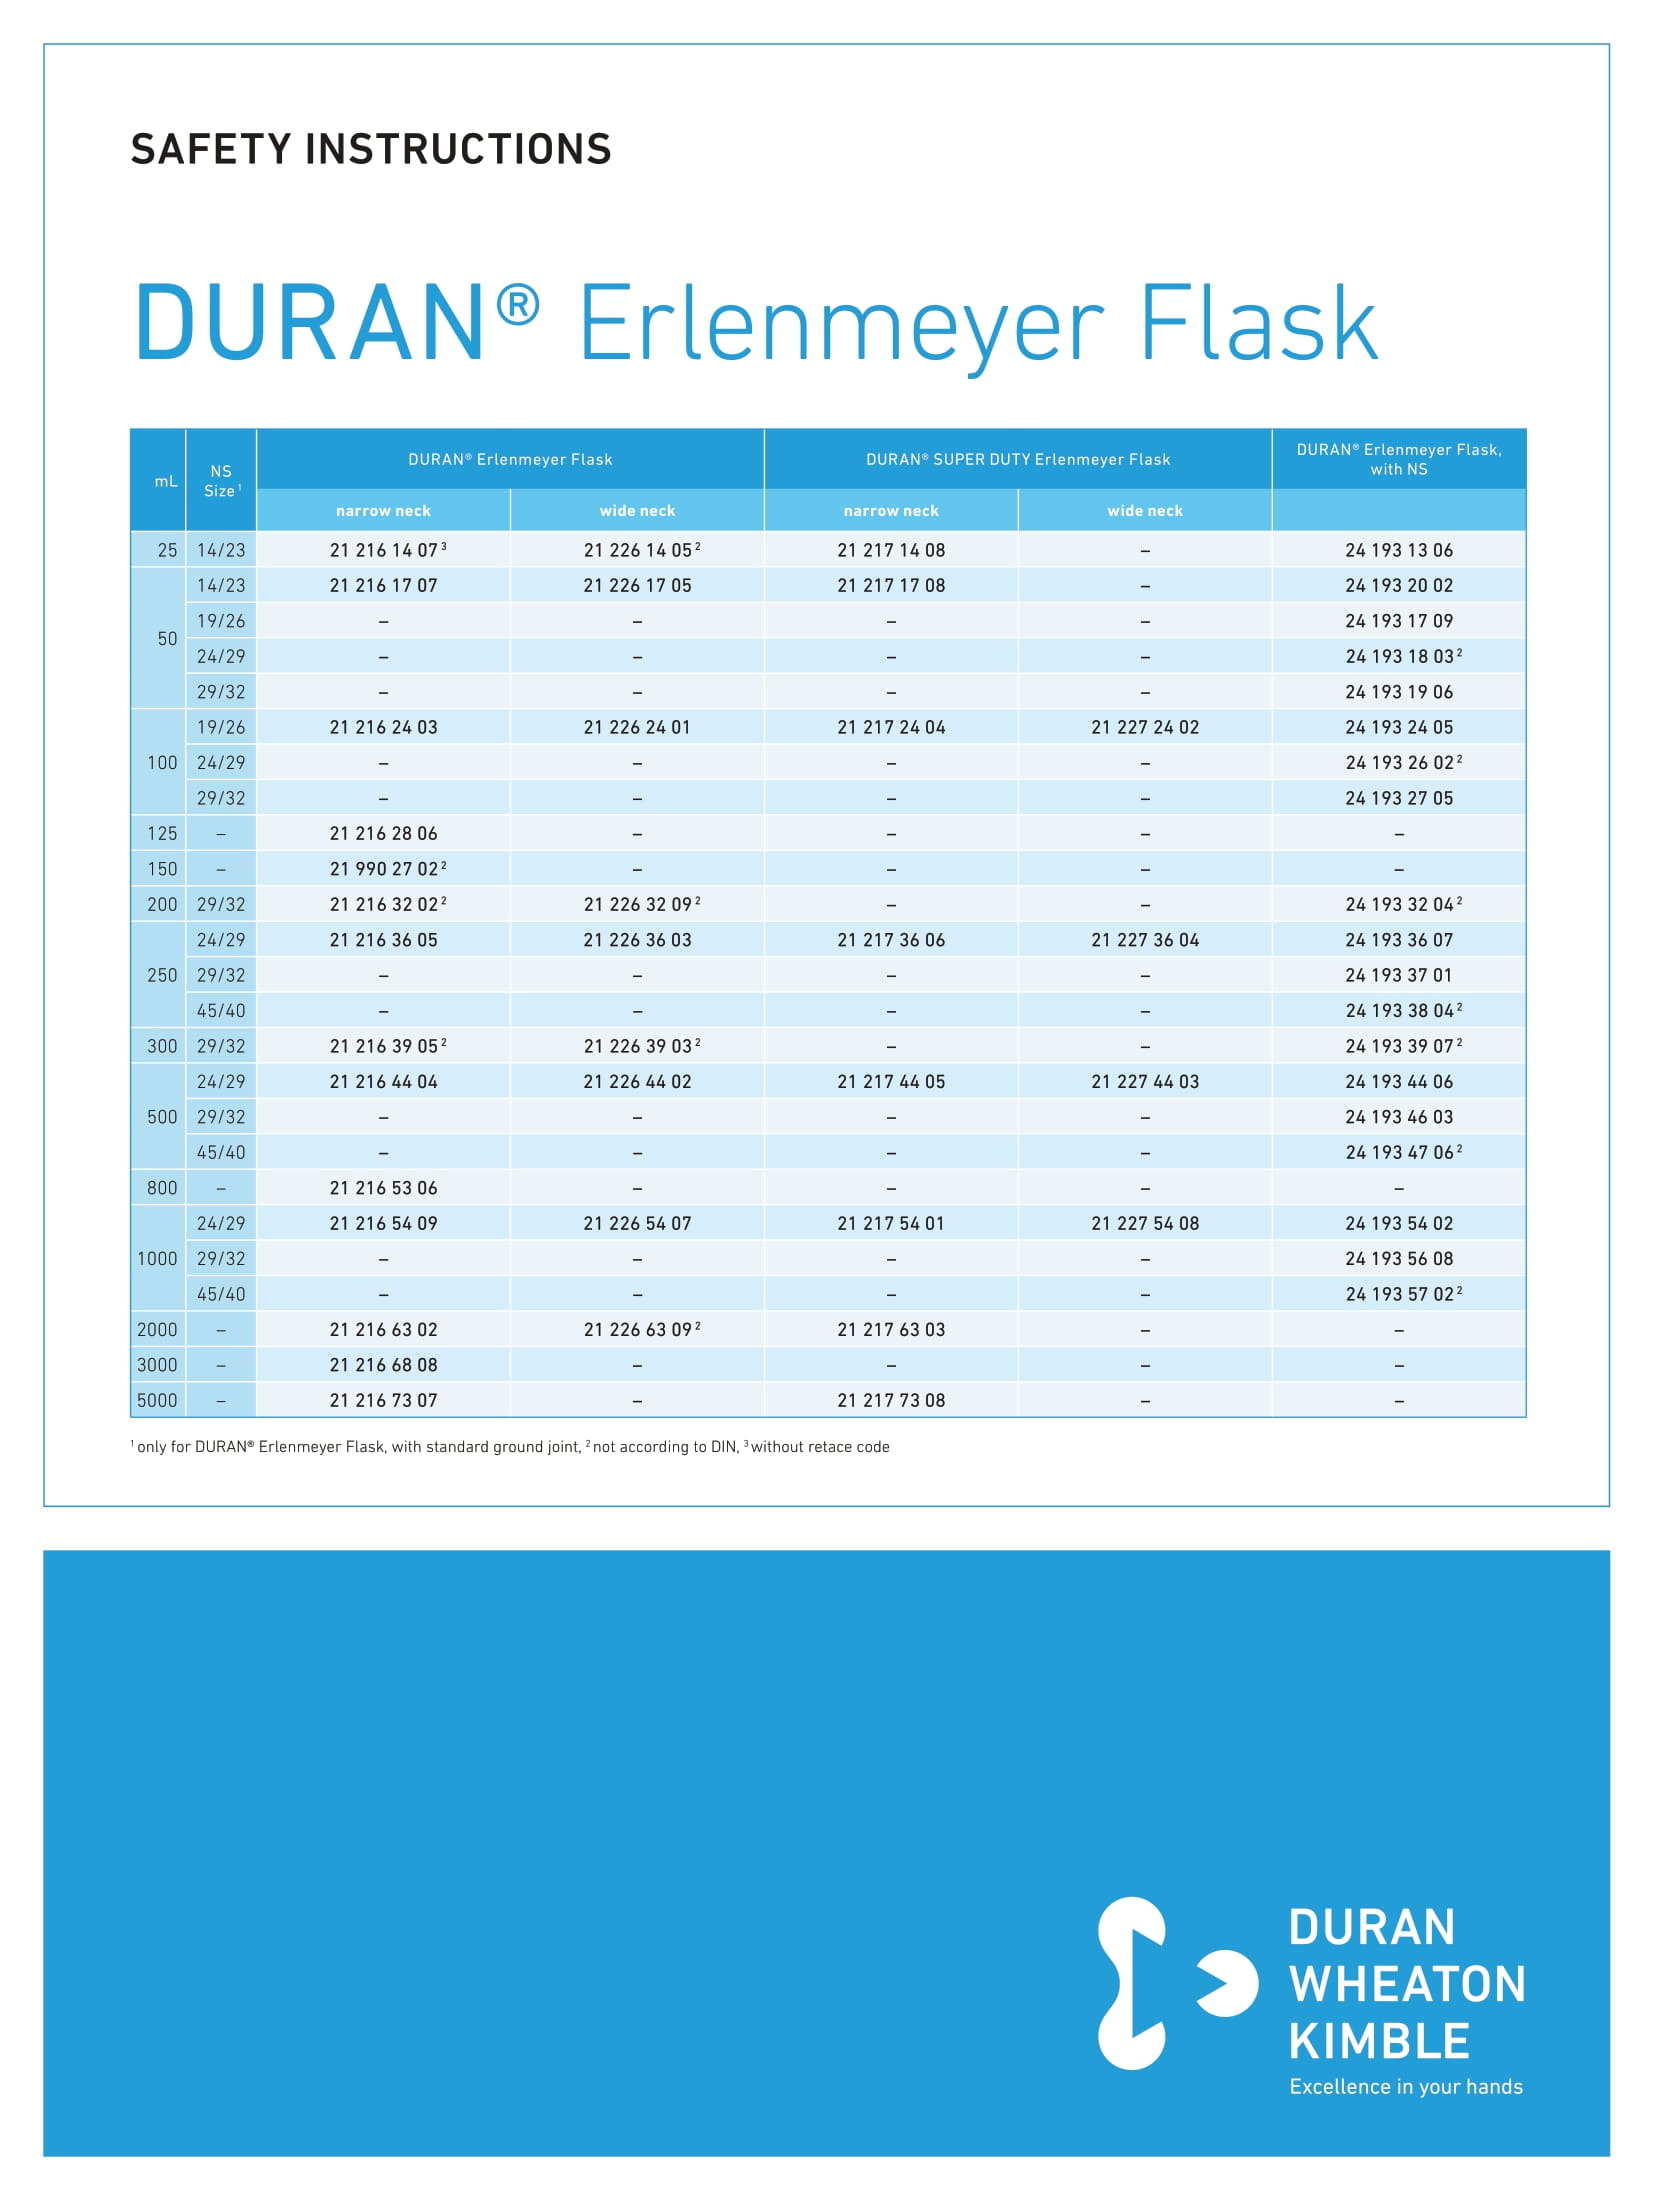 DWK SAFETY INSTRUCTIONS DURAN® Erlenmeyer Flask